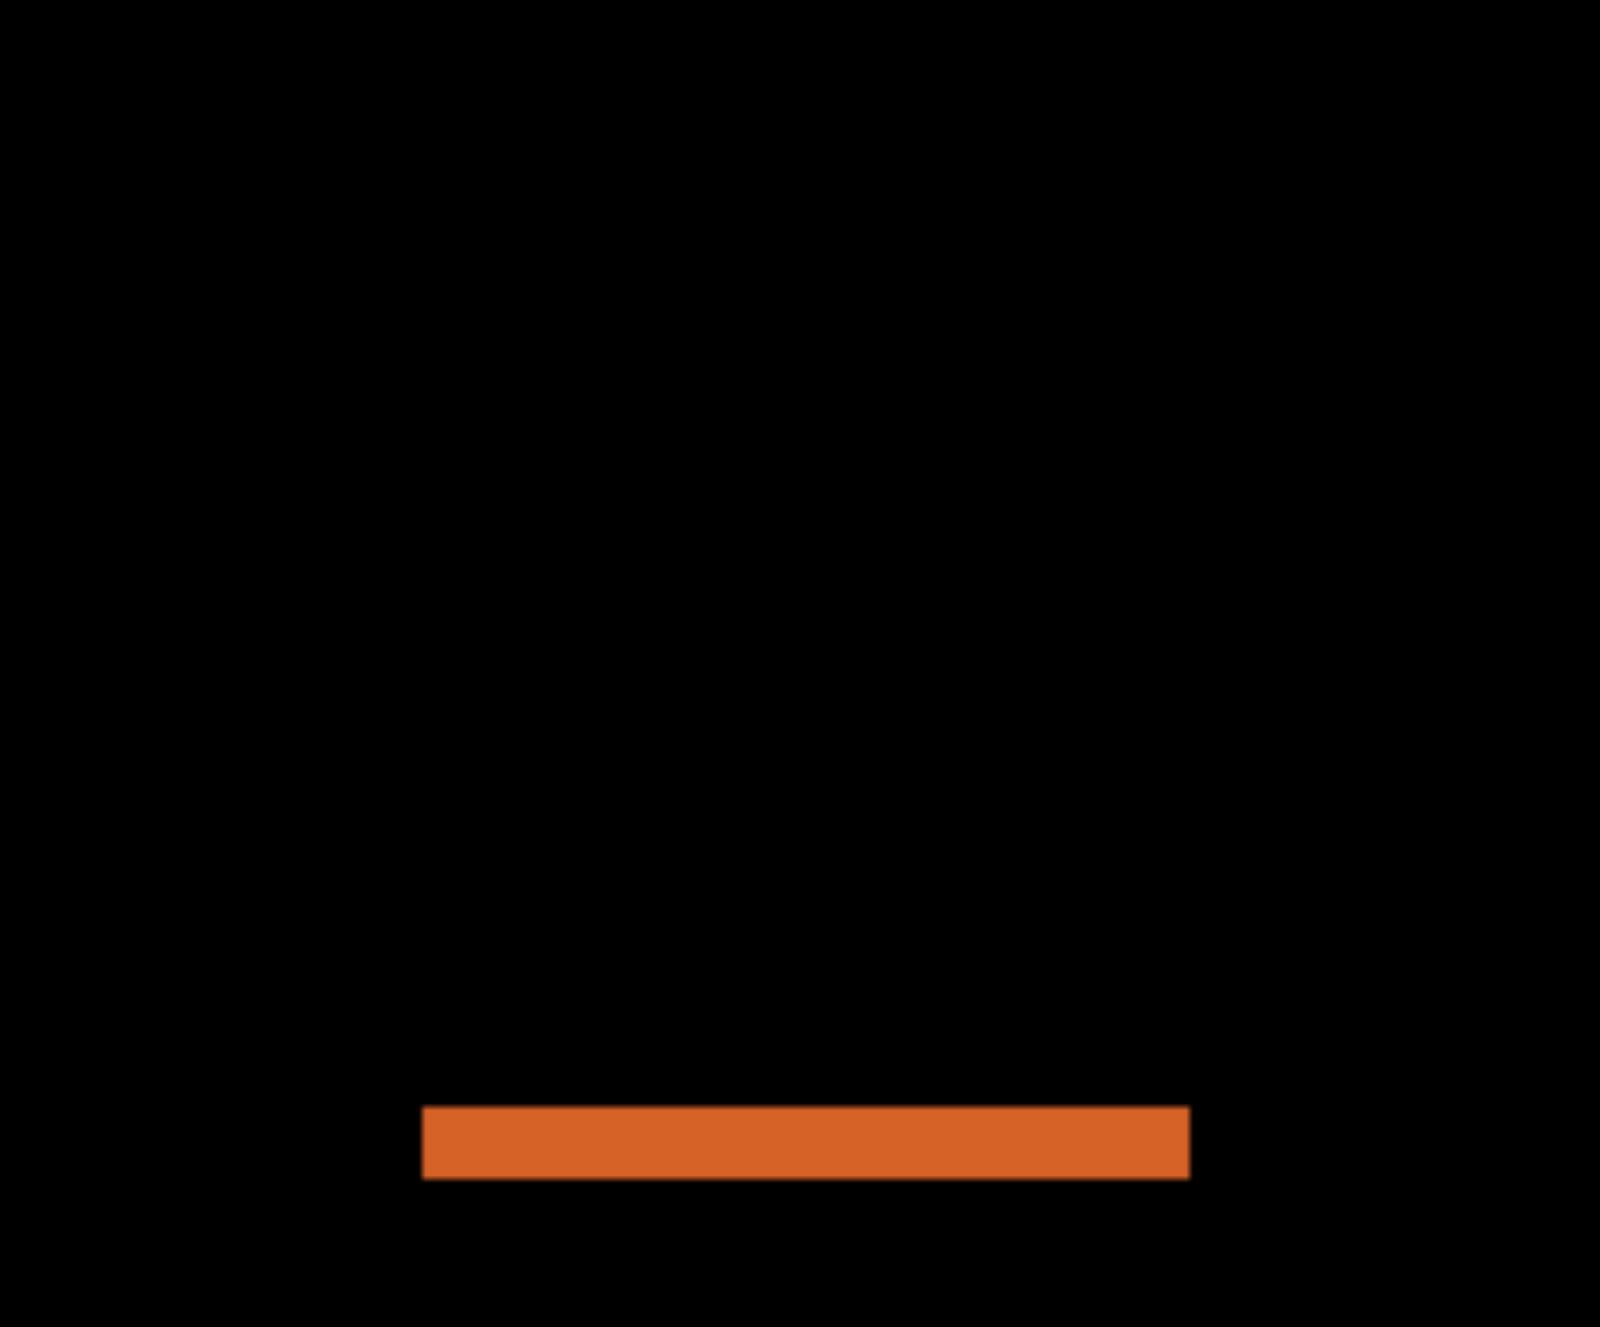 Enter SVG Clip arts